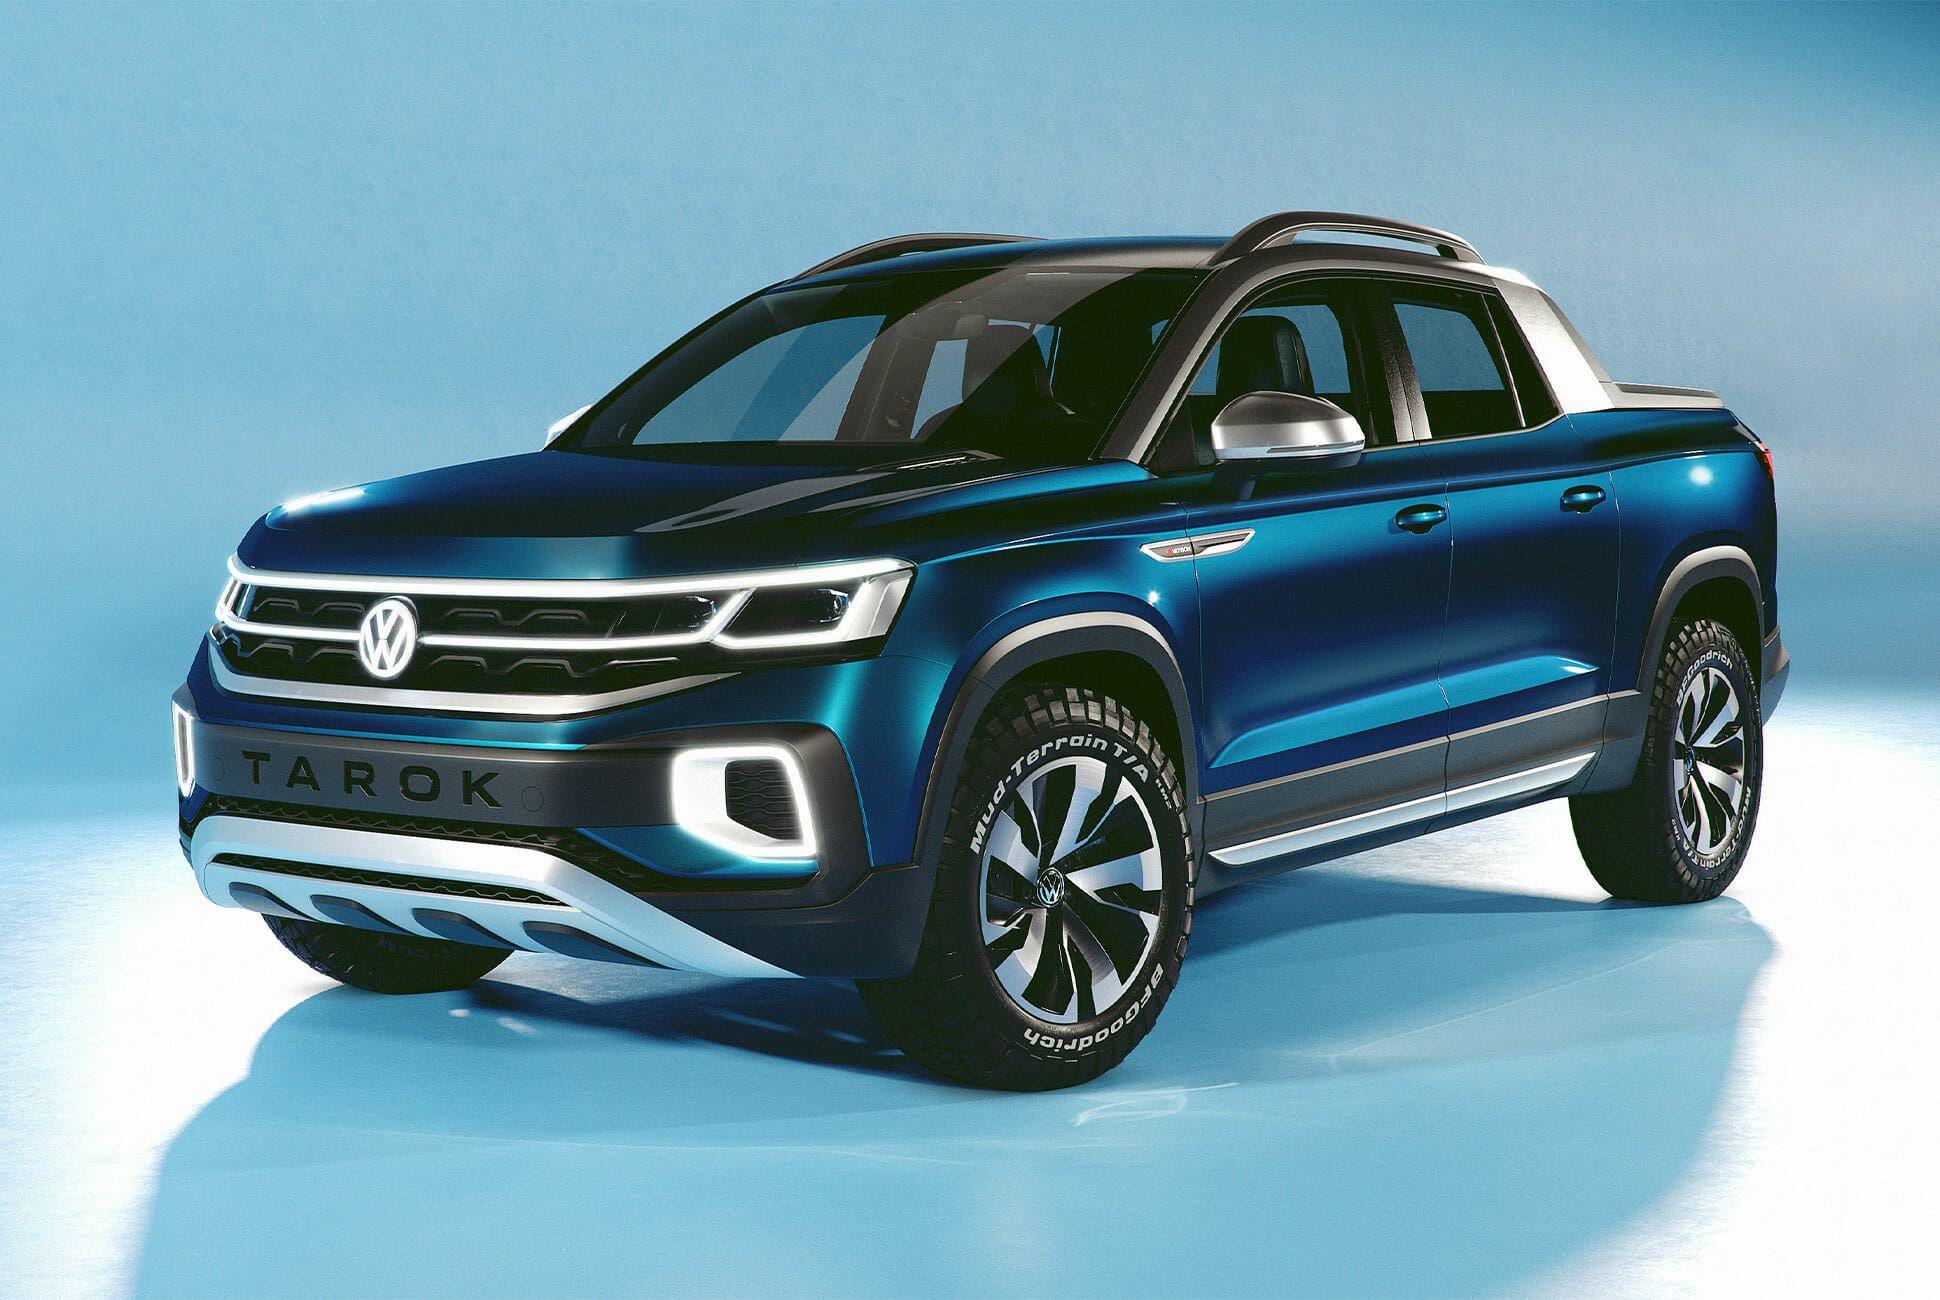 VW-Tarok-Gear-Patrol-Slide-1